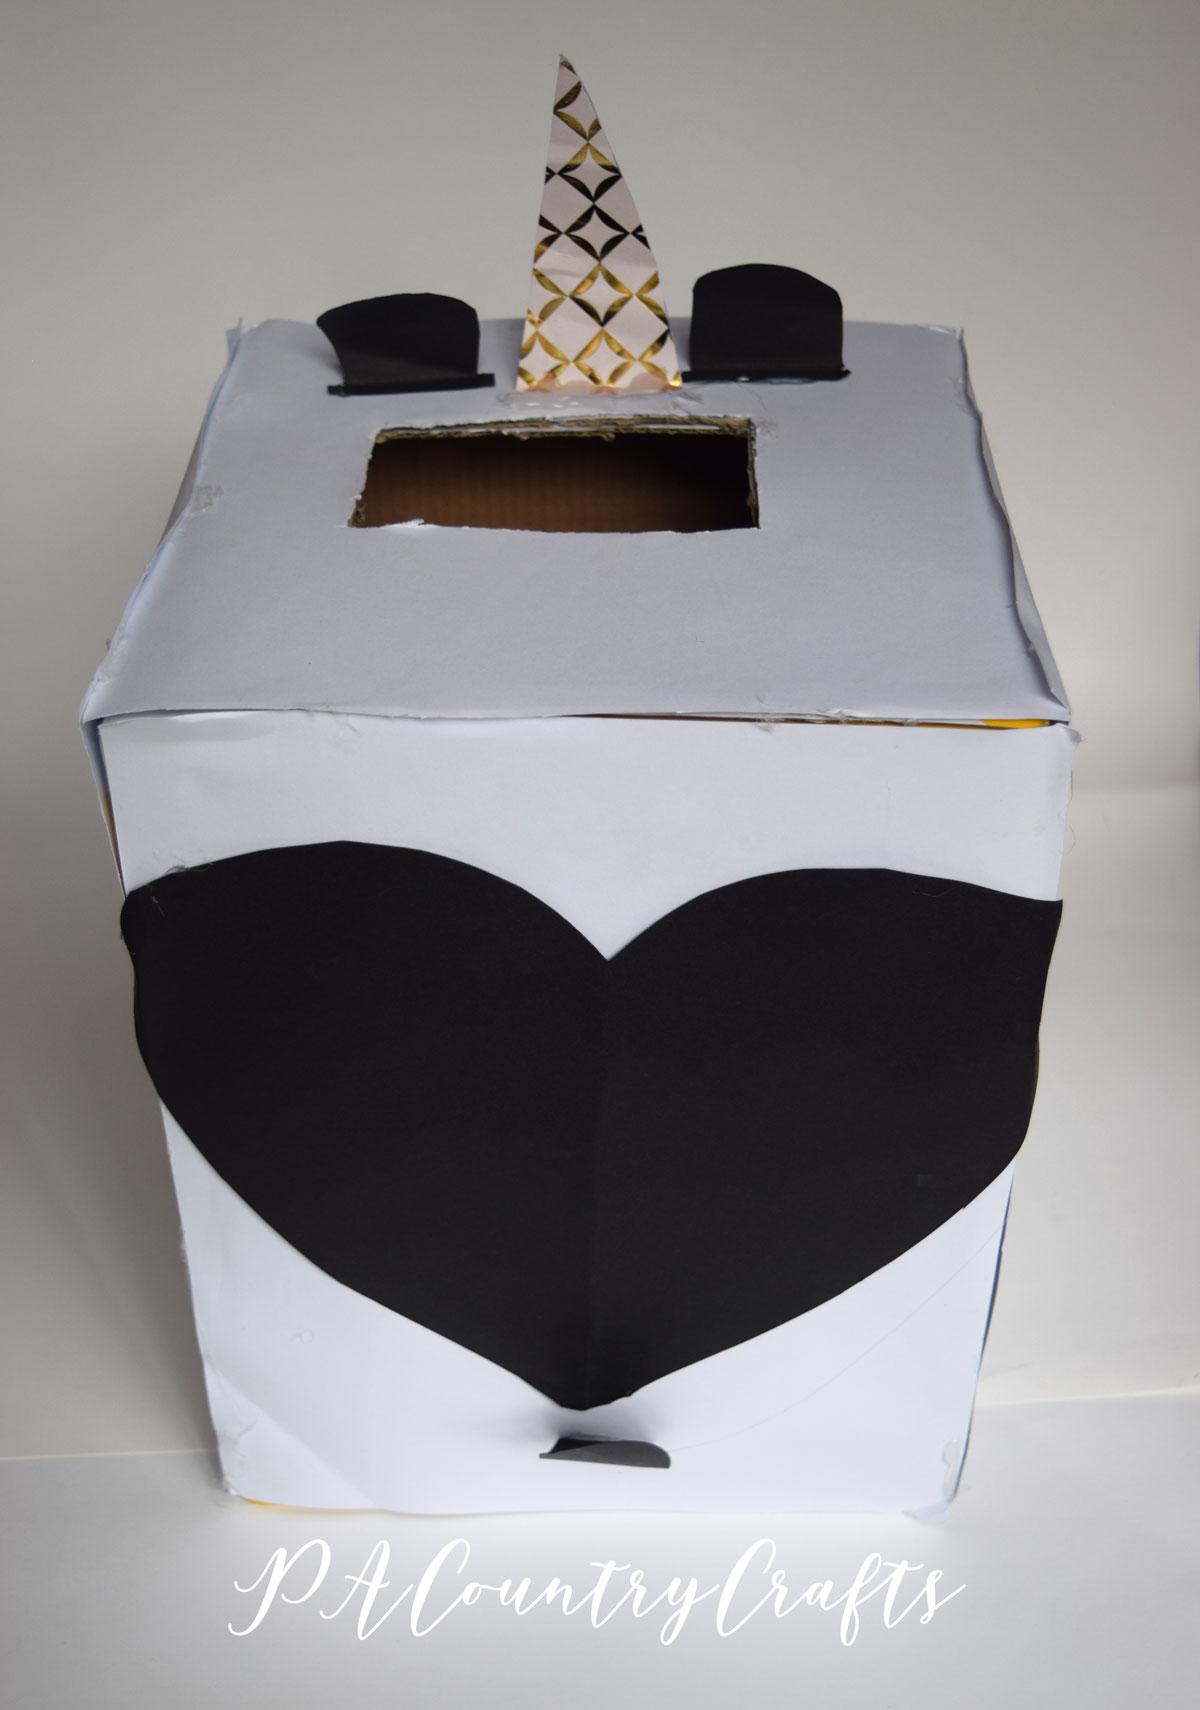 Panda valentine box made by kids!